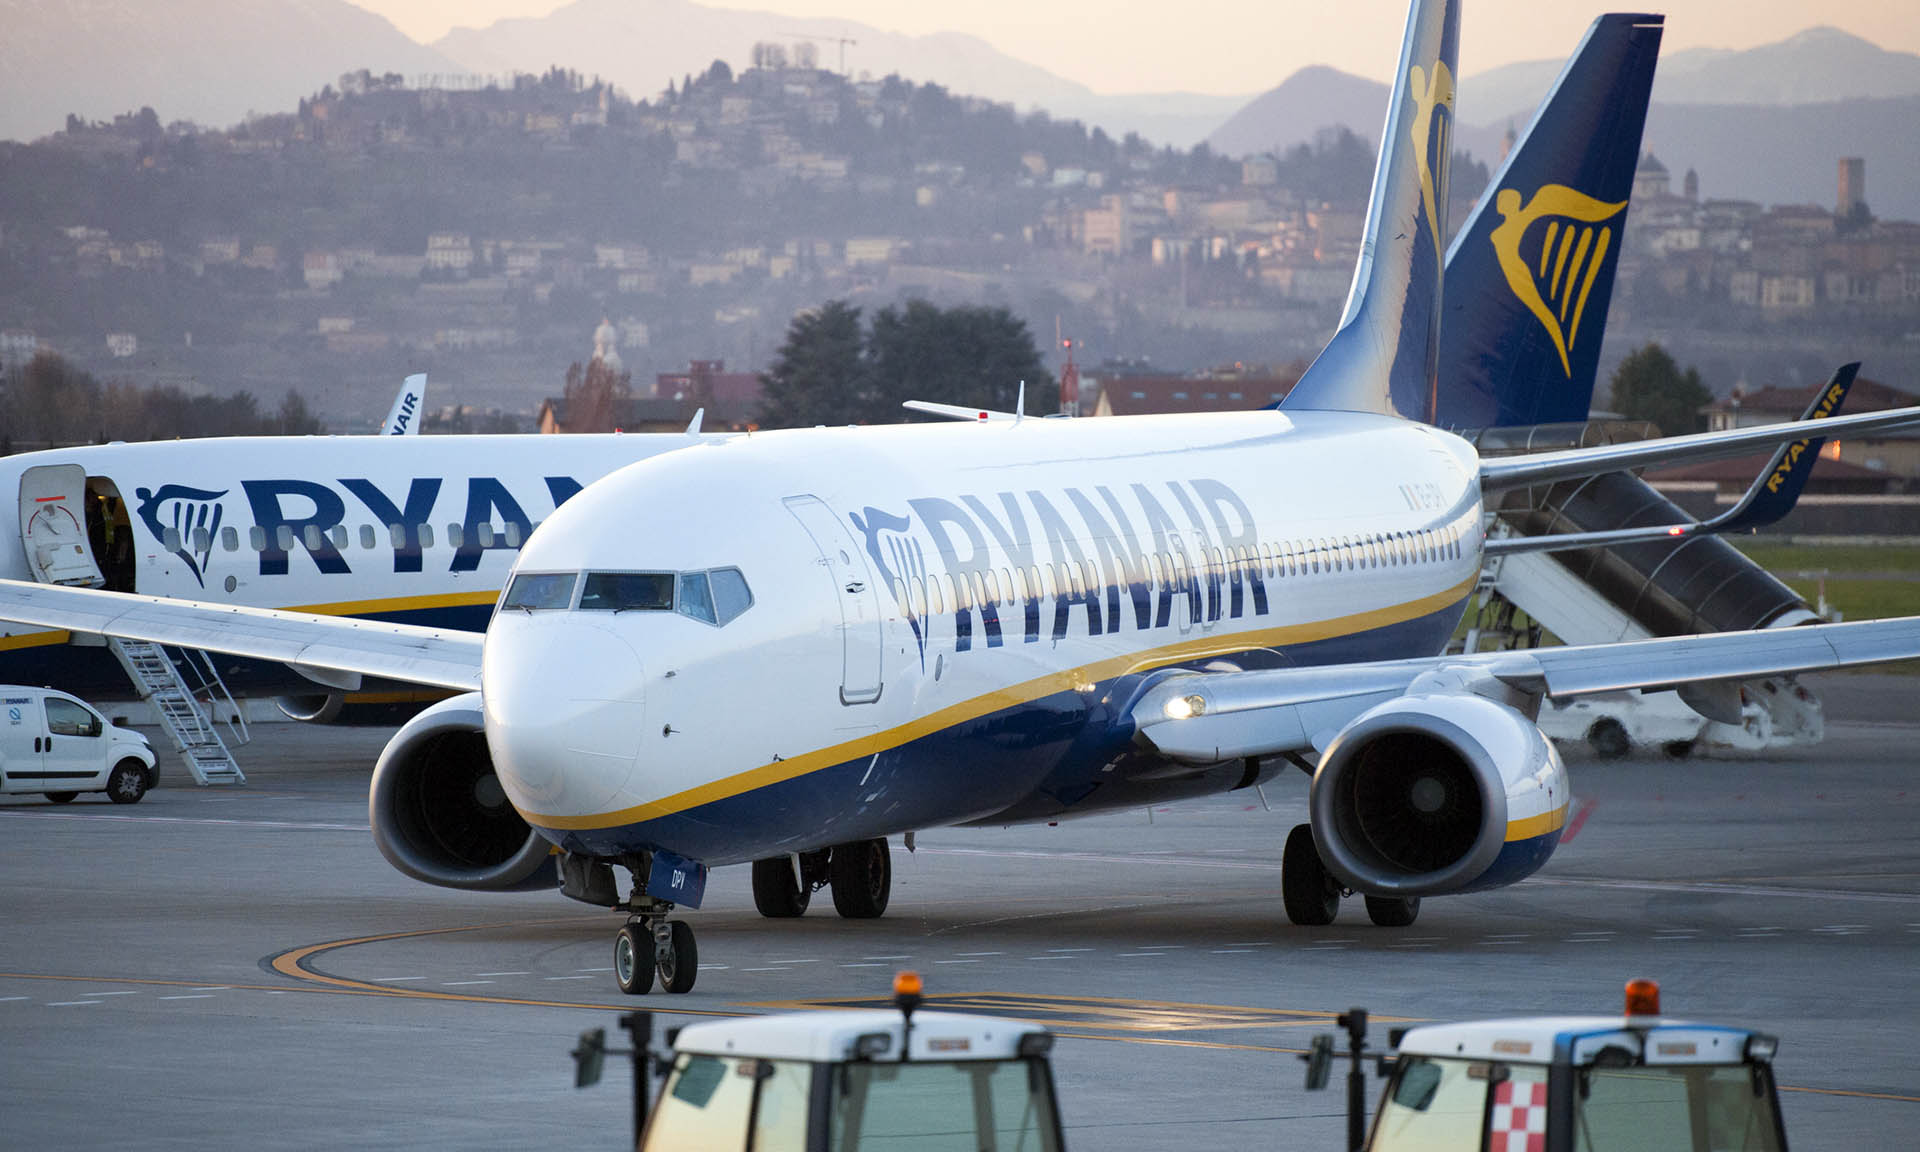 Coronavirus: Ryanair offers rescue flights as fleet is grounded until June - Aviation Business News